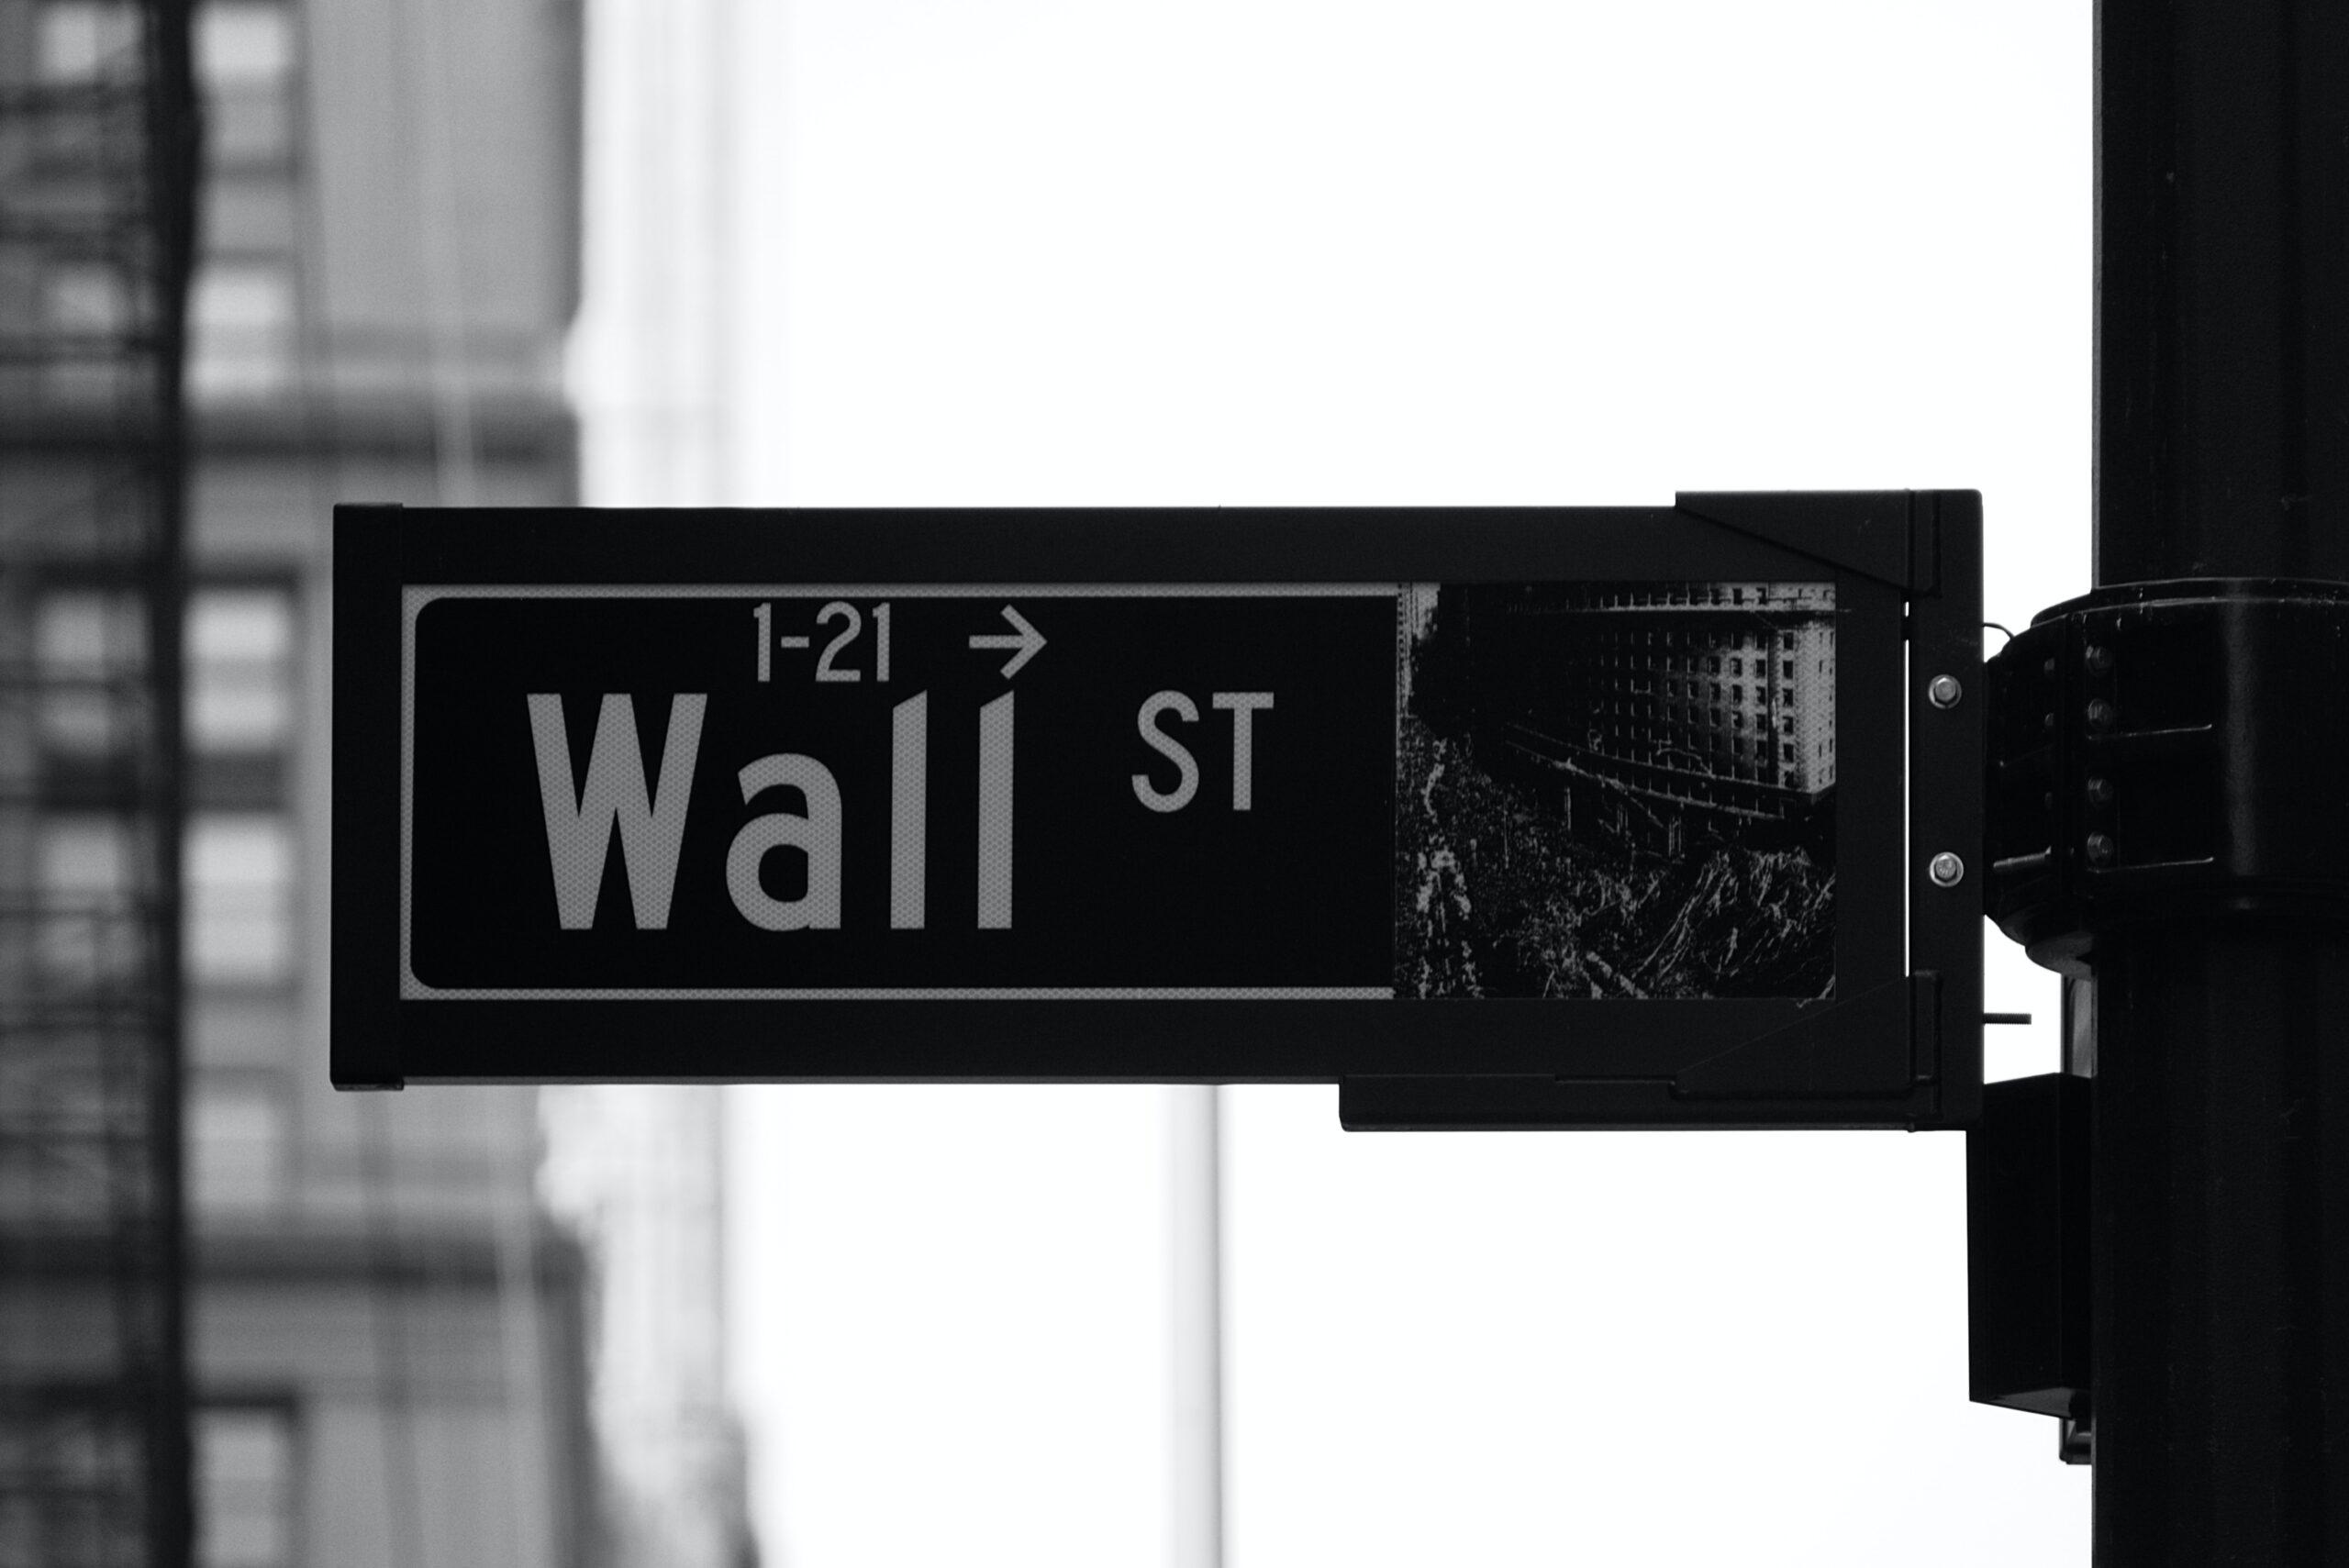 ISRAELI STOCKS – ISRAELI FOUNDED COMPANIES LISTED ON THE NEW YORK STOCK EXCHANGE – JULY '21